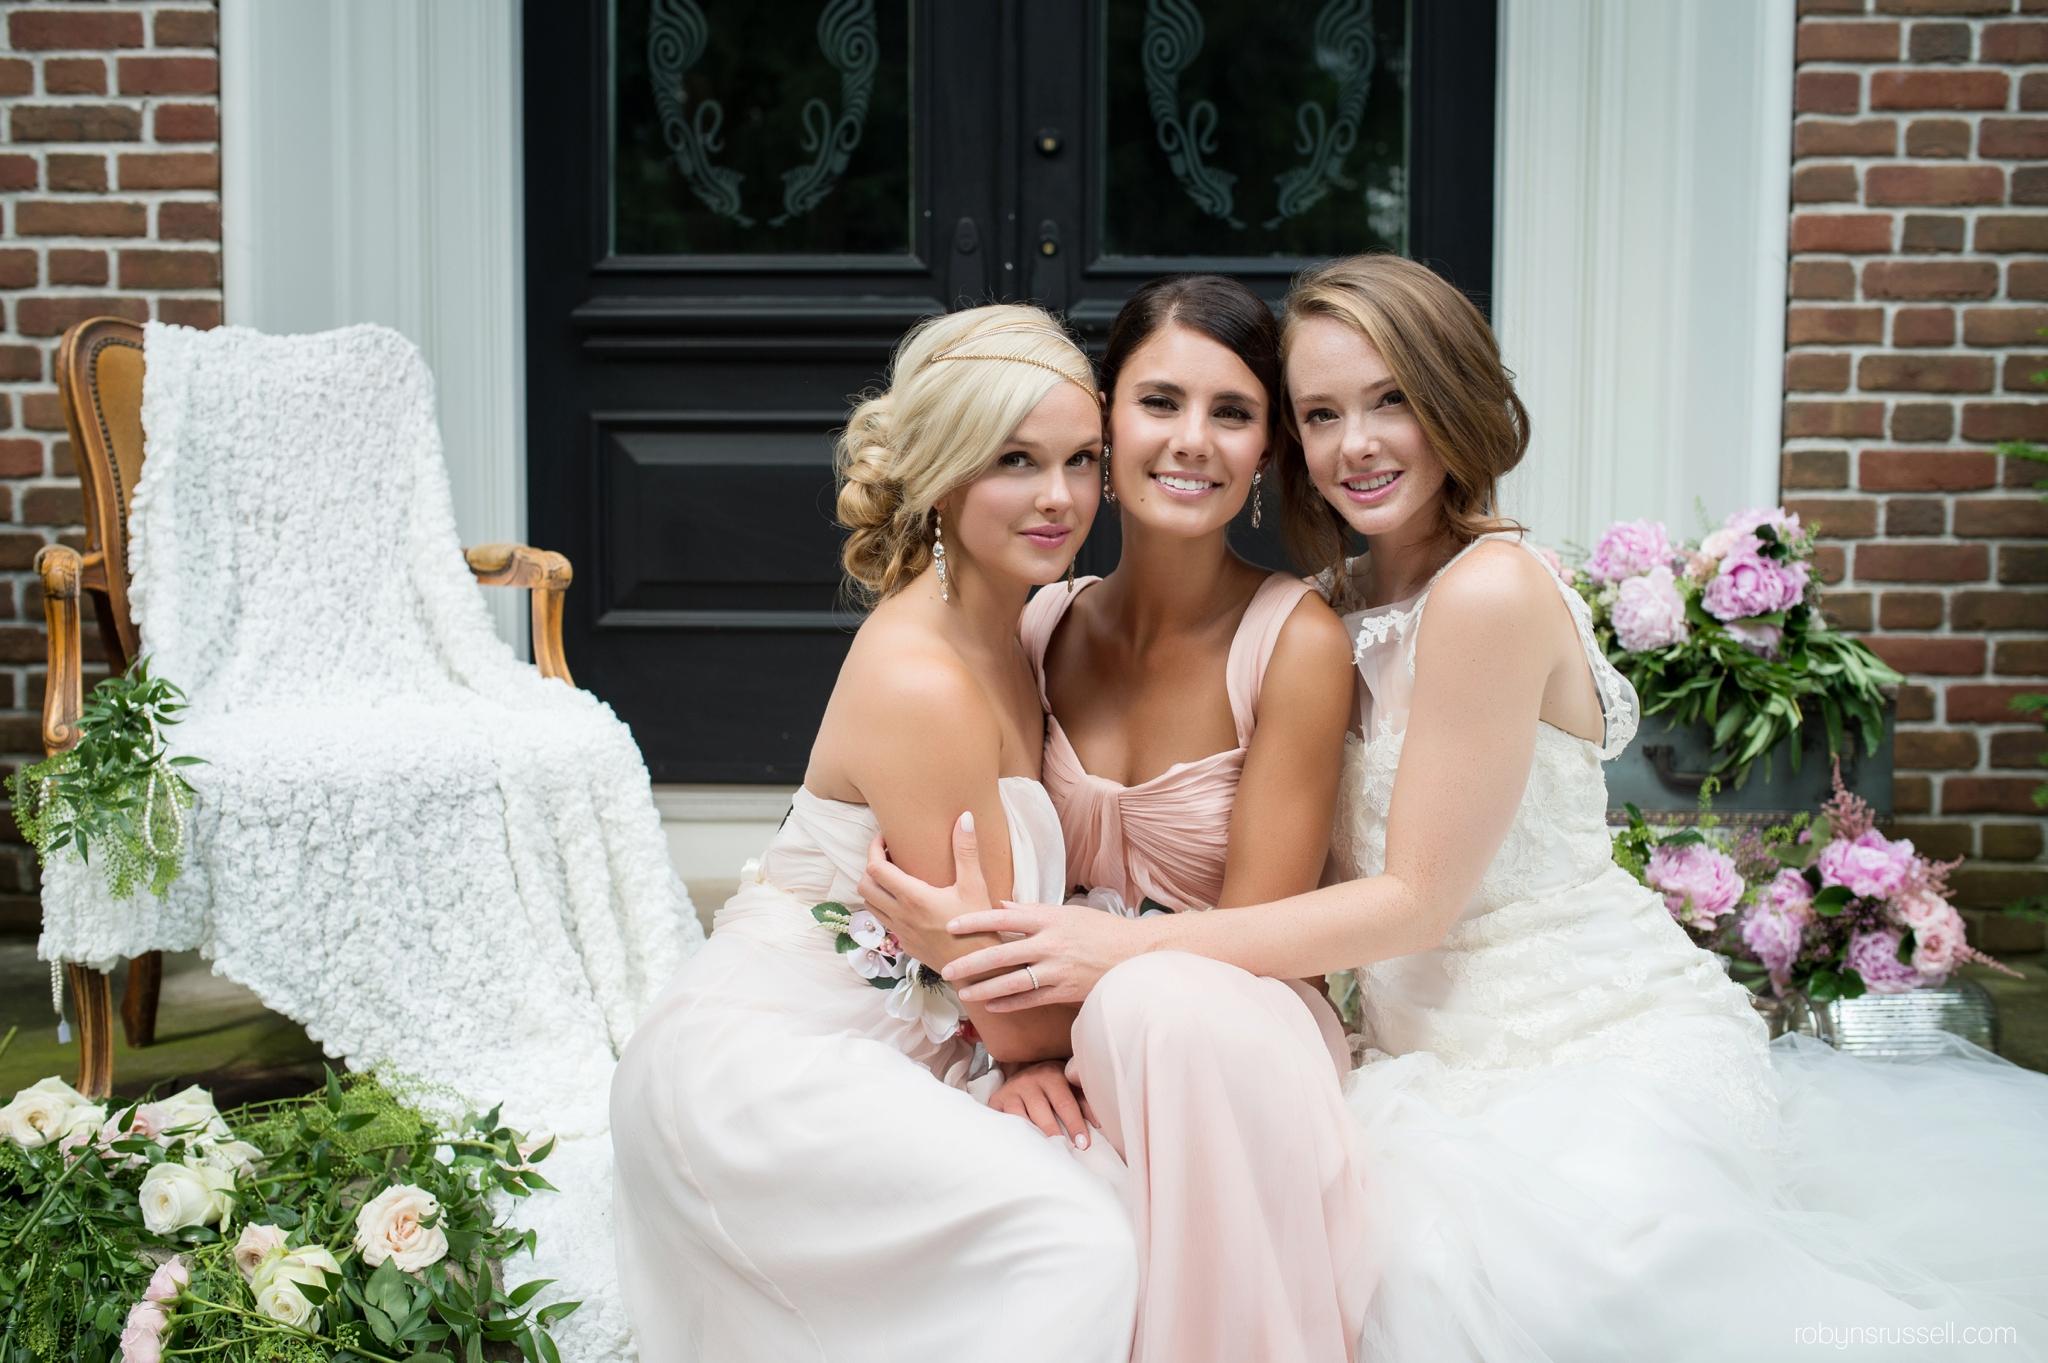 15-bride-and-bridesmaids-on-wedding-day.jpg